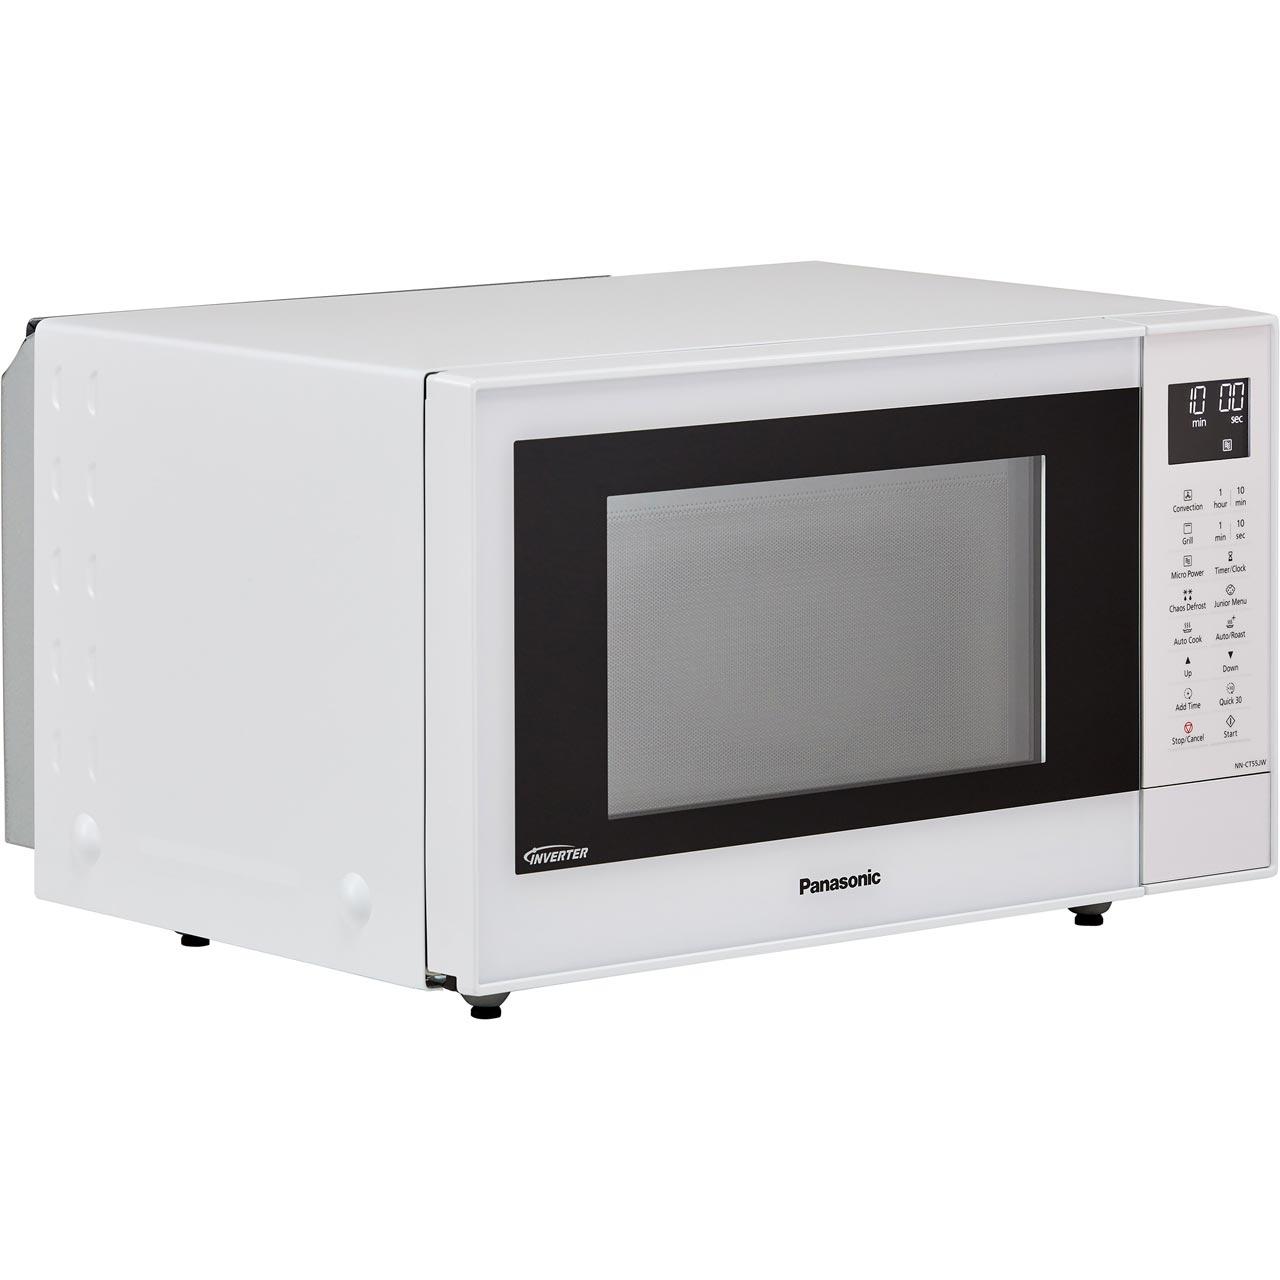 Nn Ct55jwbpq Wh Panasonic Microwave